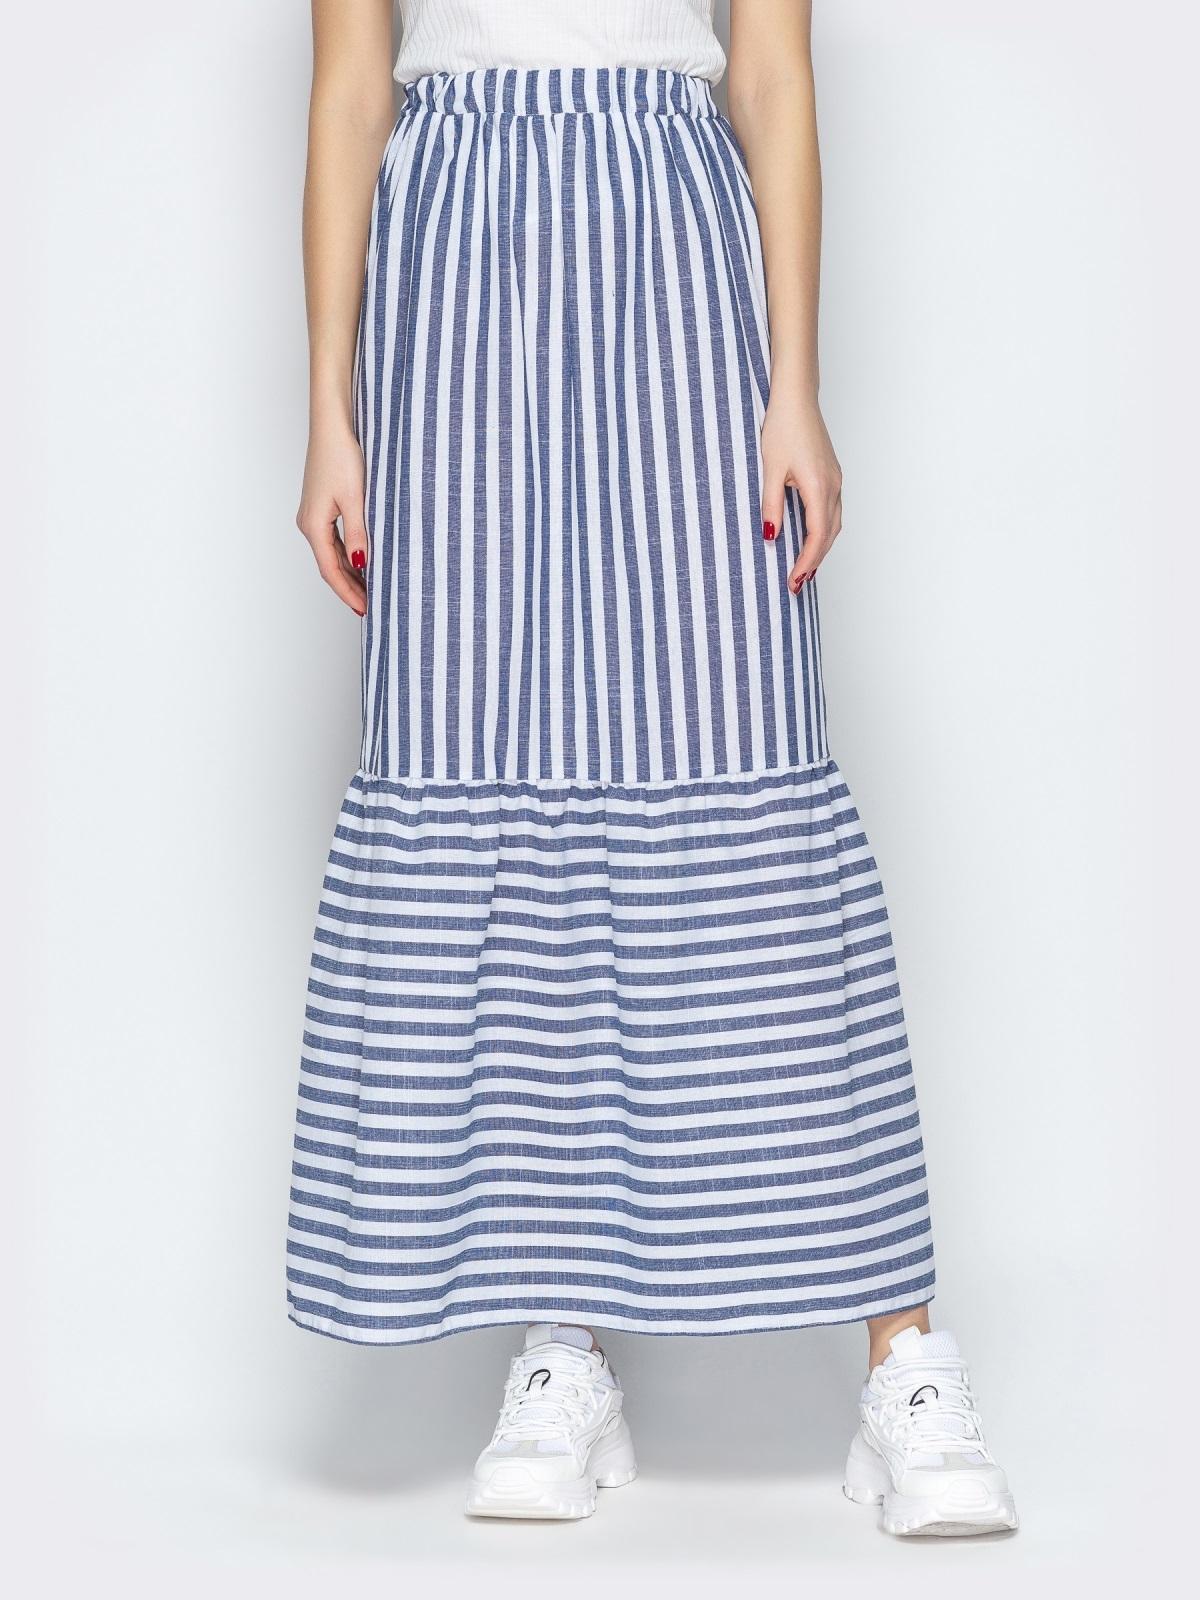 Тёмно-синяя юбка в полоску на резинке с воланом по низу - 20503, фото 1 – интернет-магазин Dressa